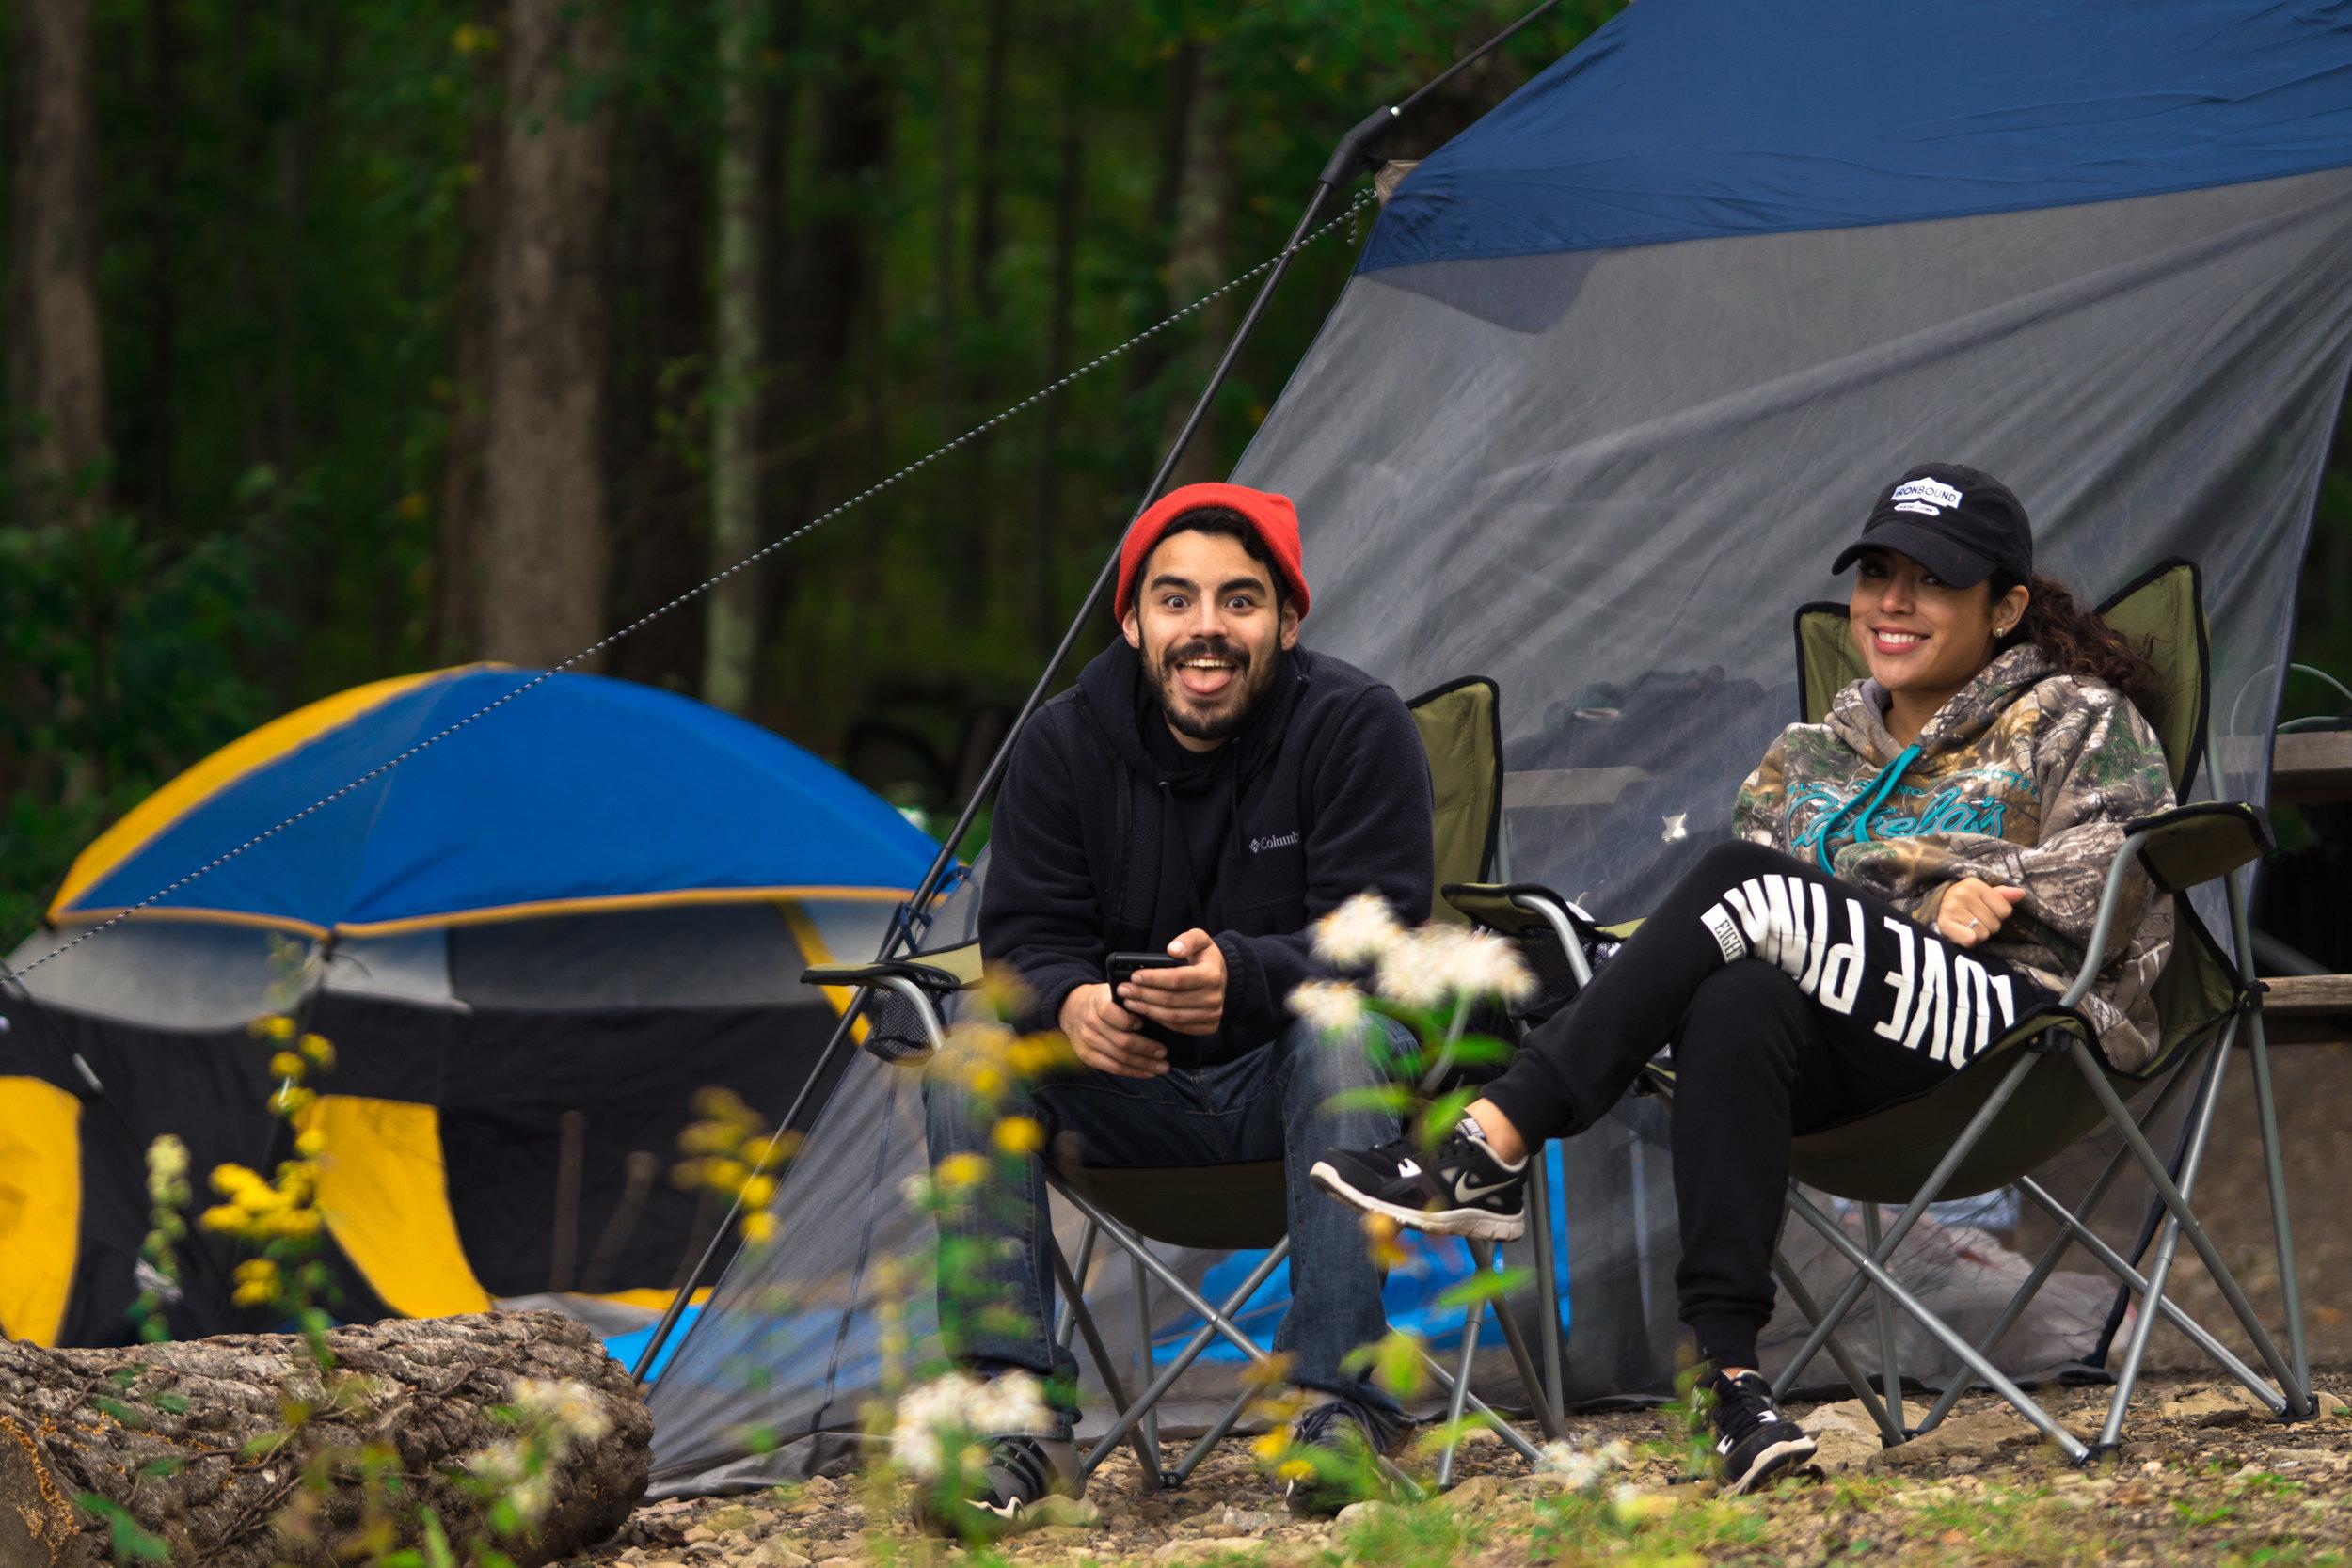 High Point Camping Trip Roman Family-22.jpg